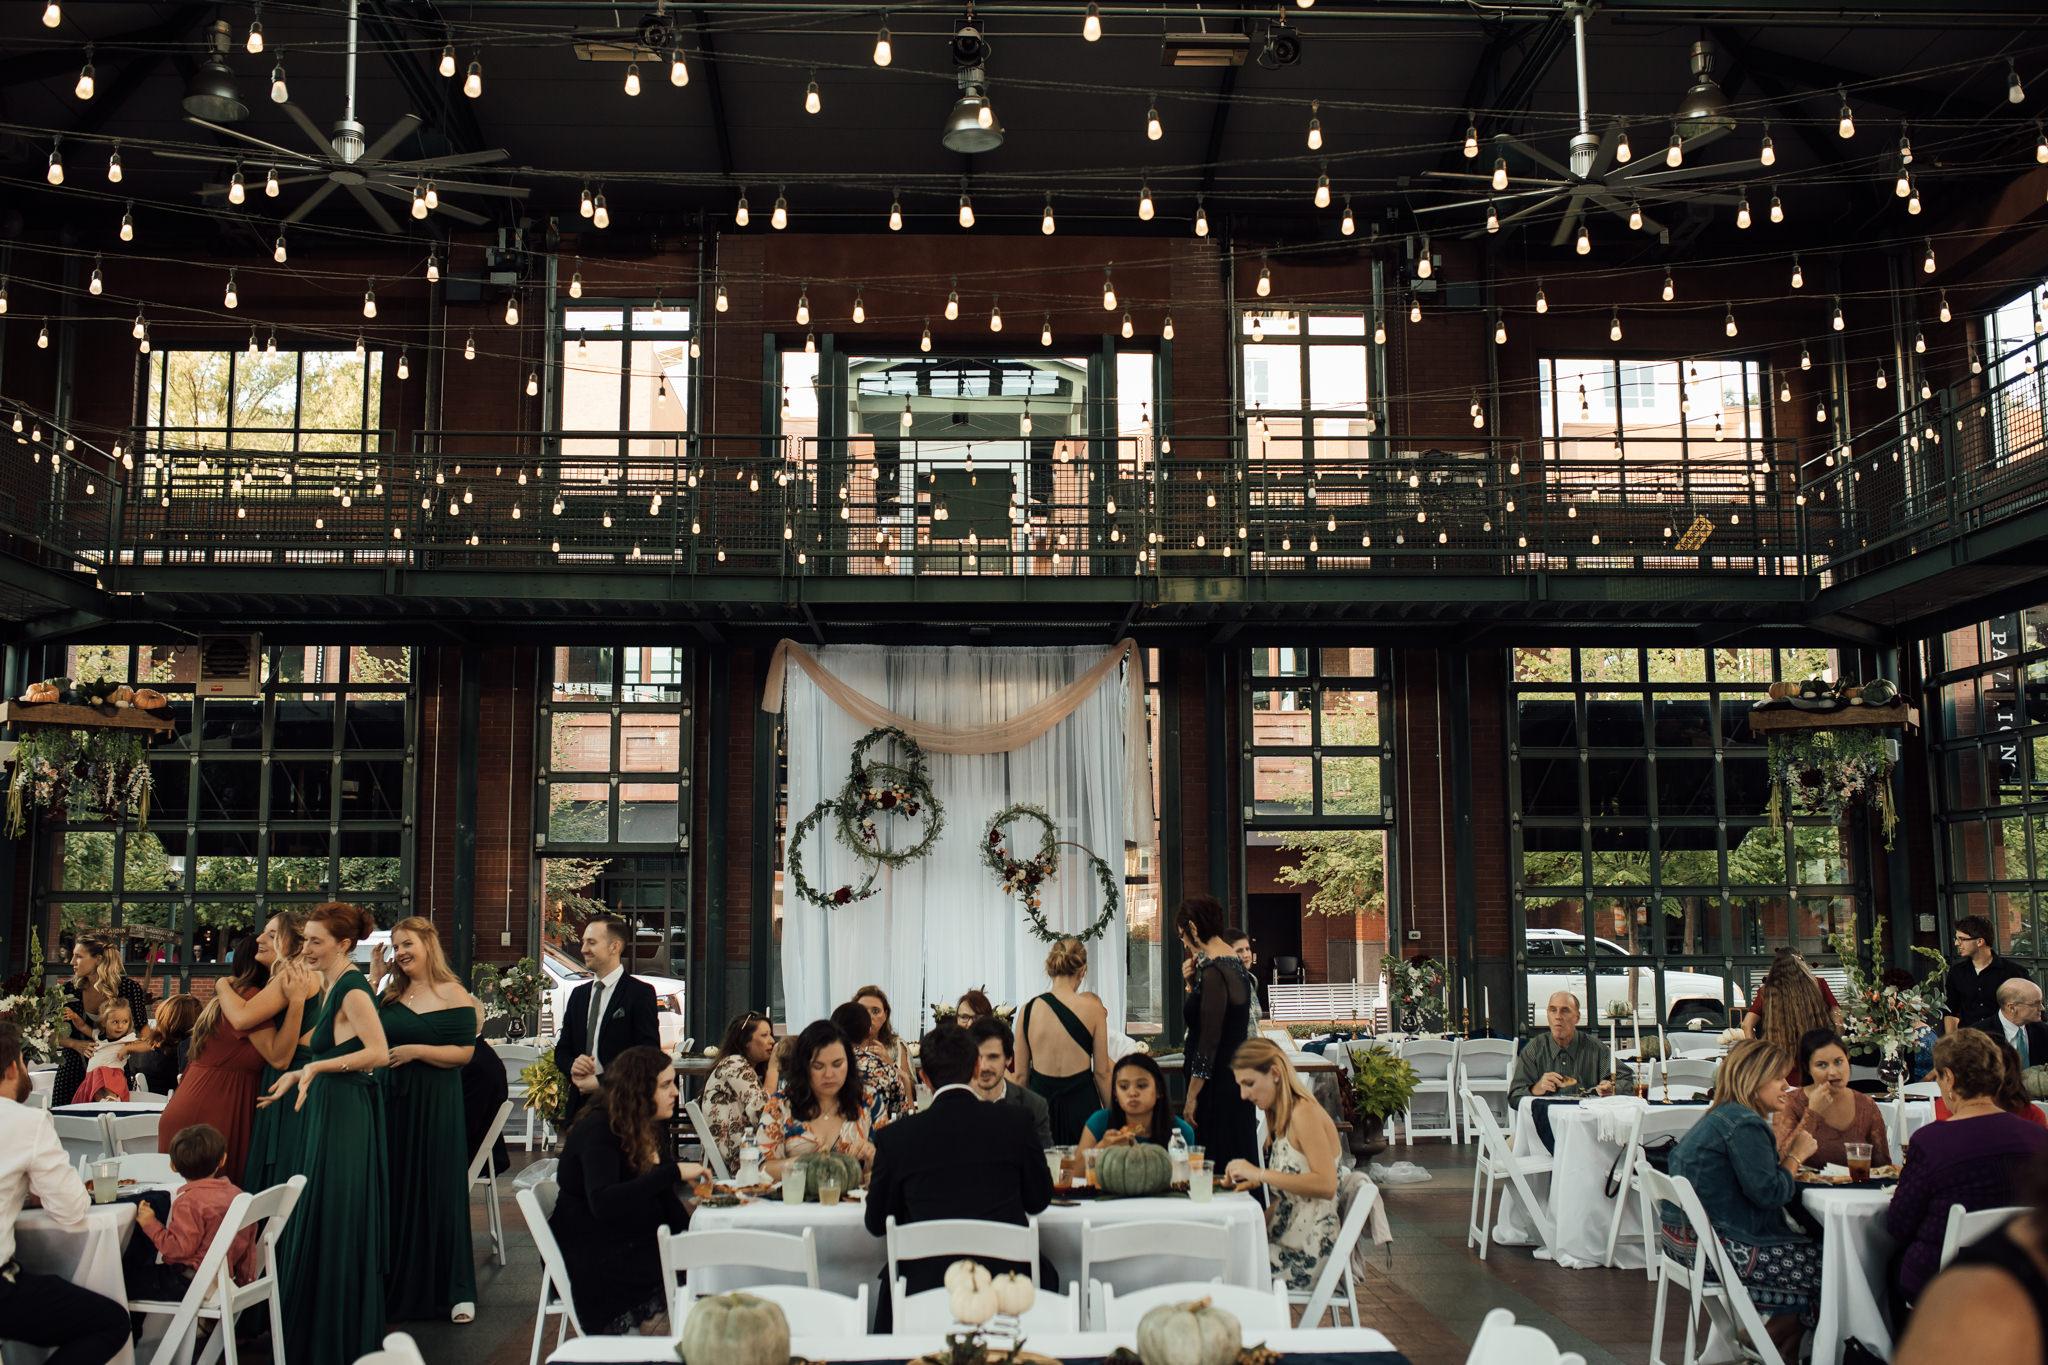 cassie-cook-photography-chattanooga-wedding-photographer-waterhouse-pavillion-cassie-matt-wedding-95.jpg